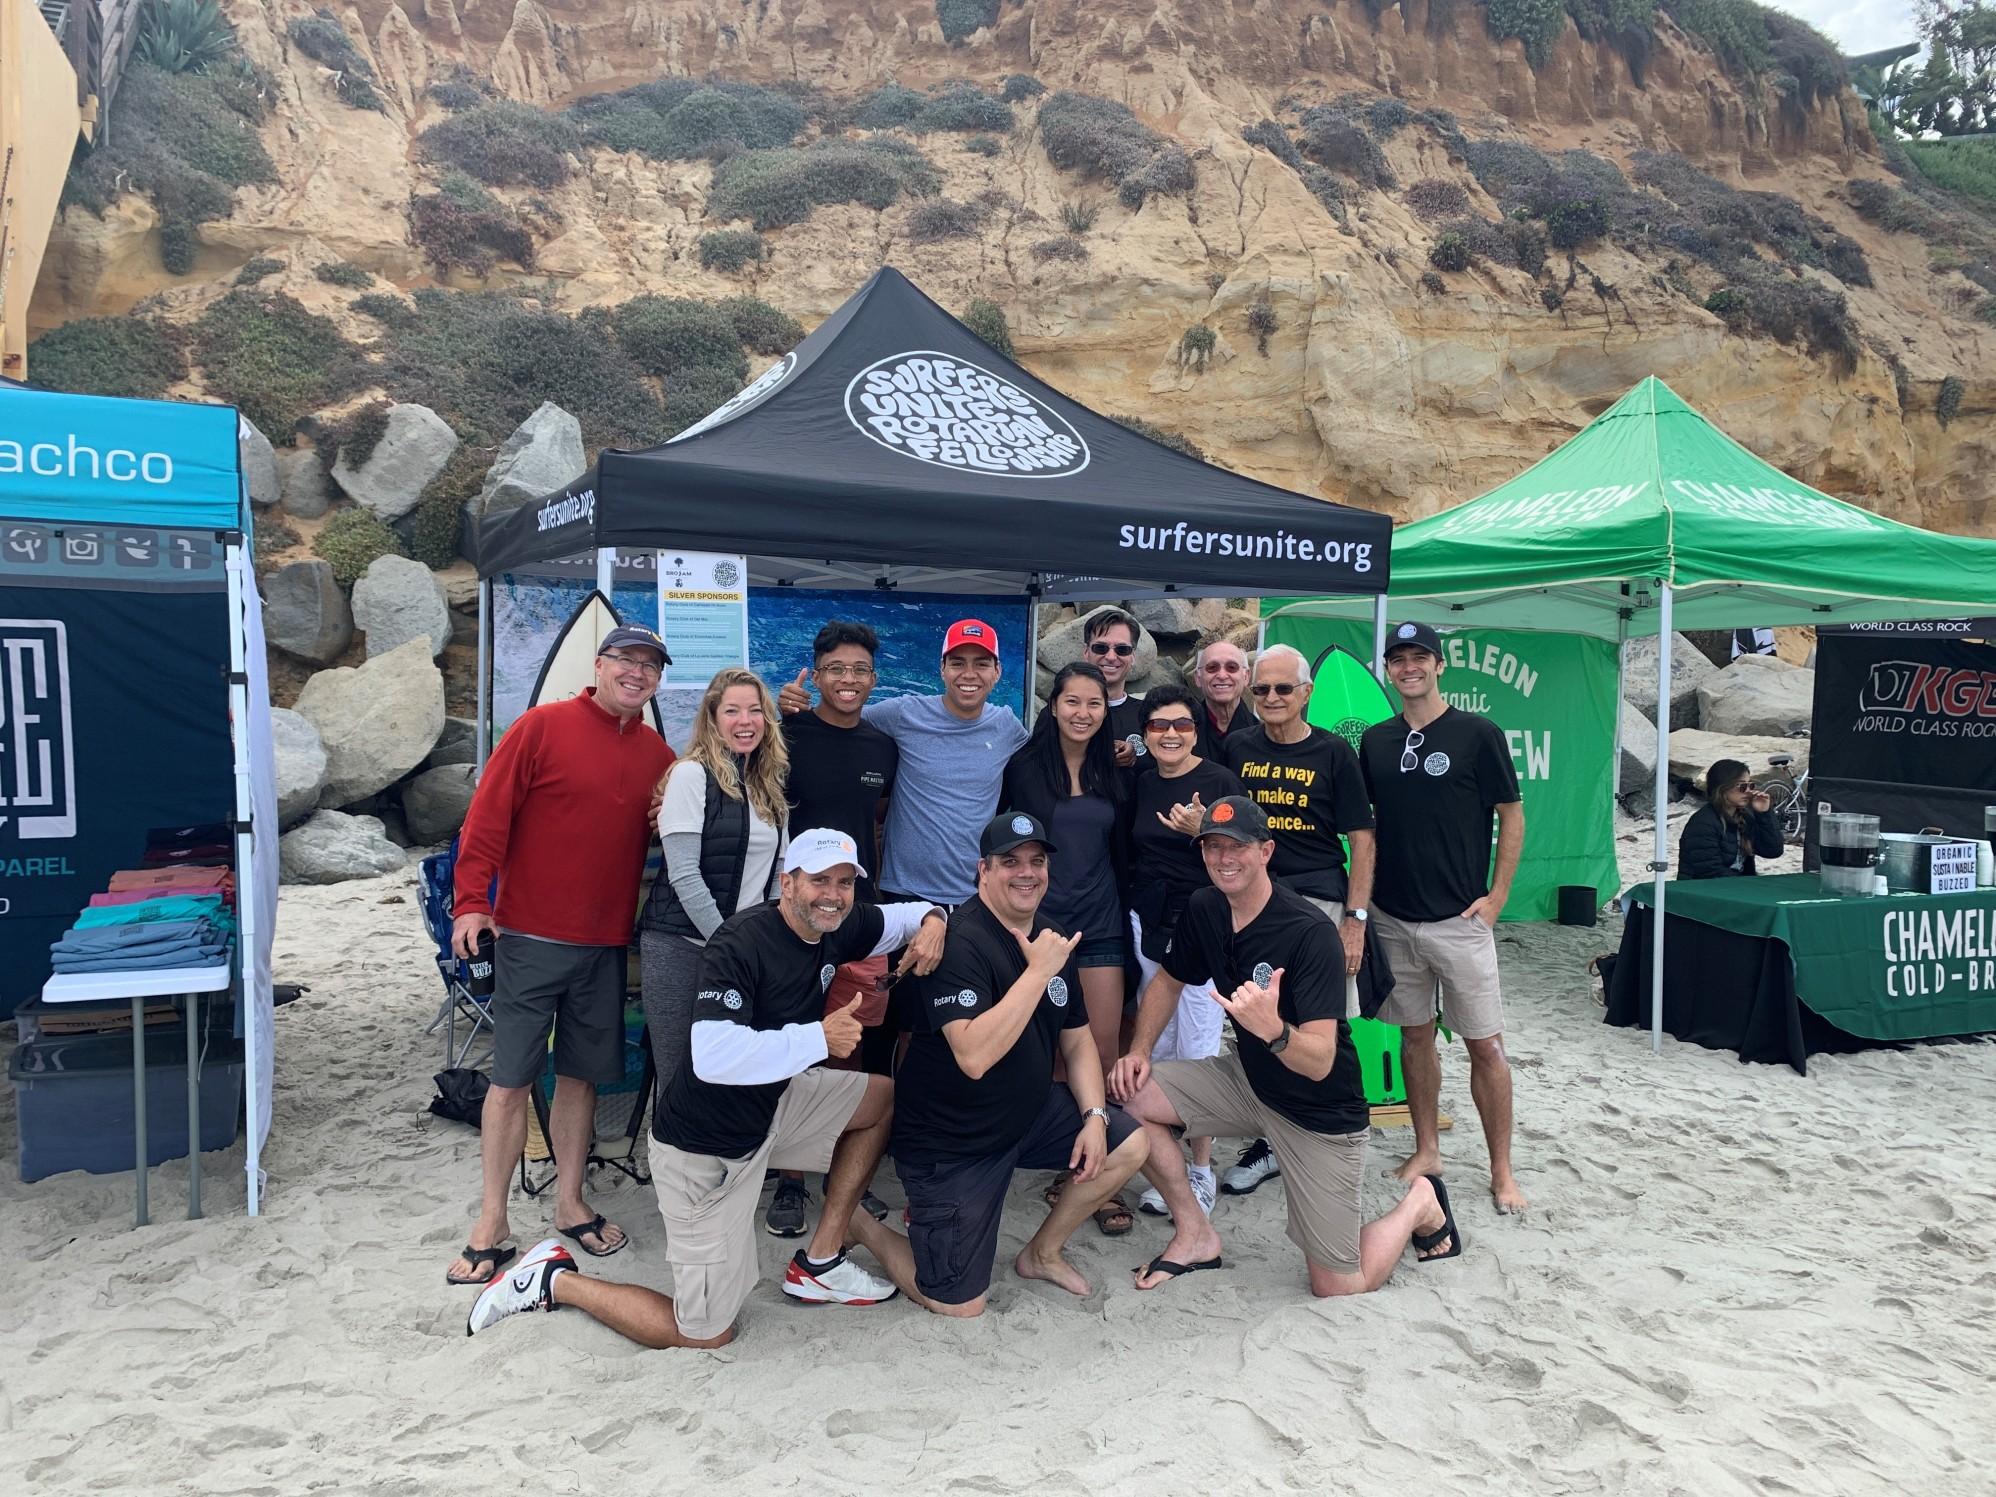 Surfers Unite members at the 2019 BroAM